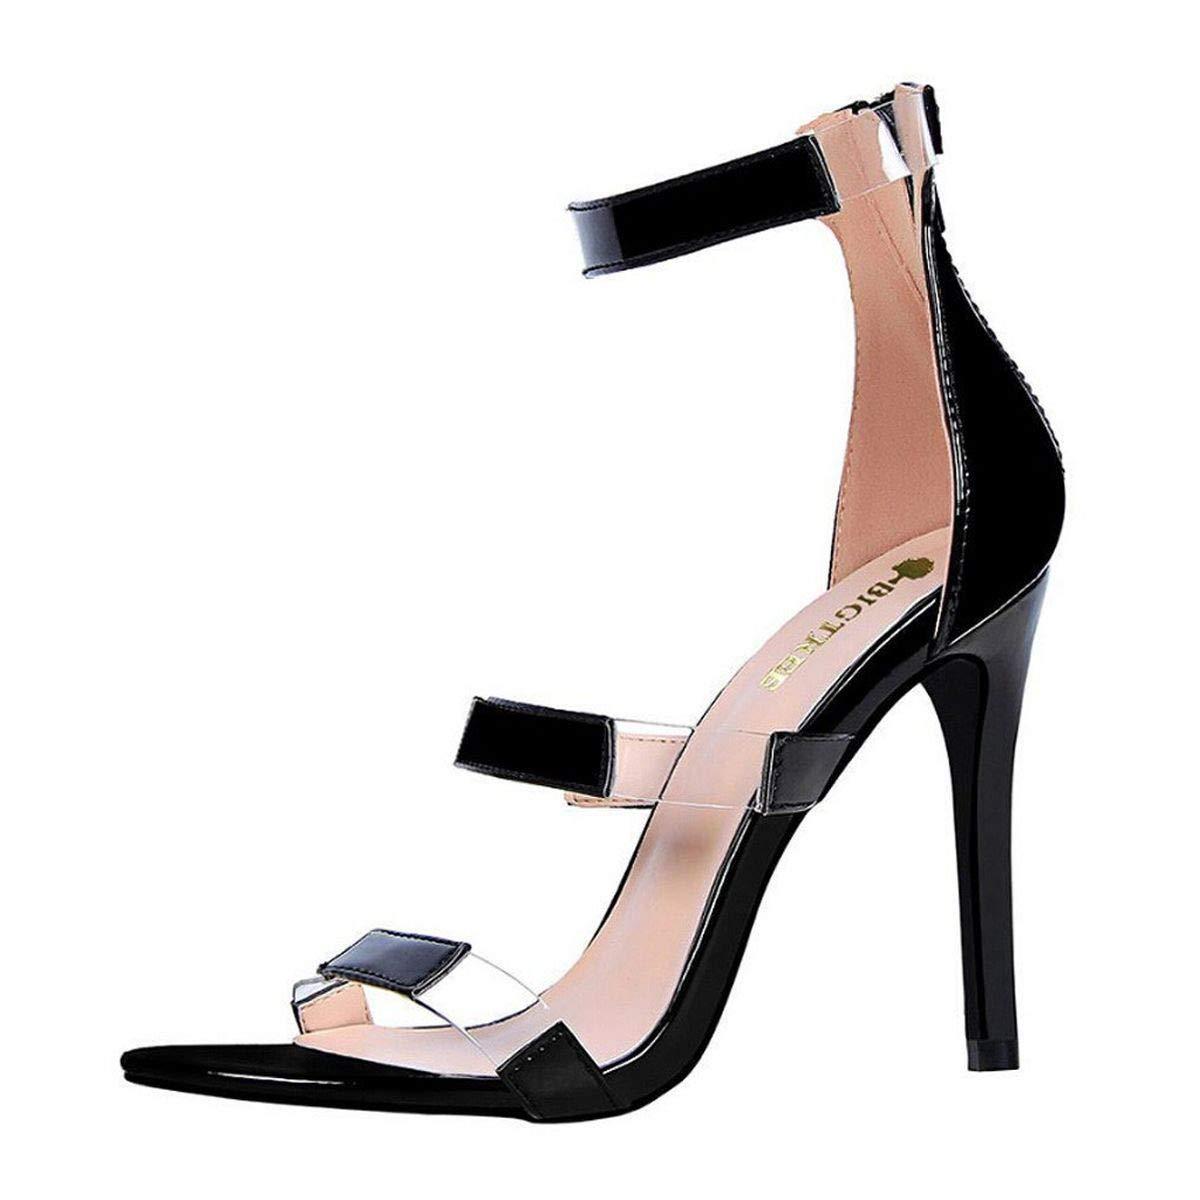 Meiliwanju Women's Triple Straps Stiletto Sandals Open Toe Ankle Strap Dress Party Stiletto High Heel Sandals Bridal Party Shoes (Black, 6.5) by Meiliwanju